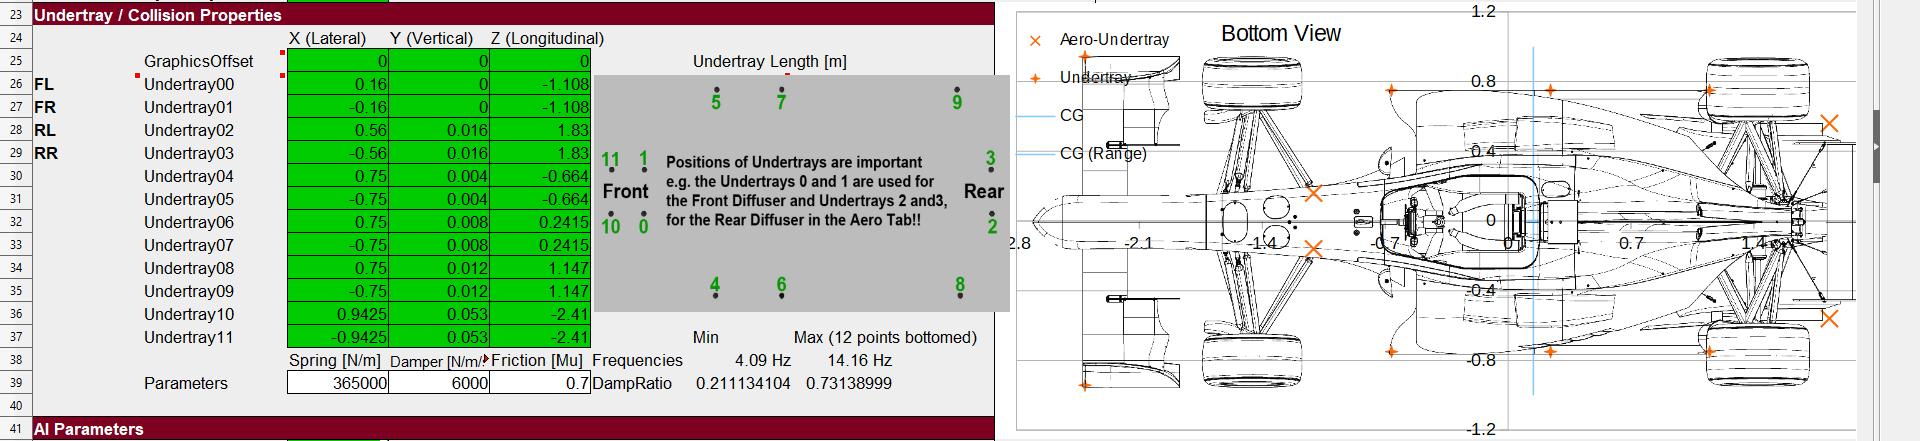 GP3_undertrays.jpg